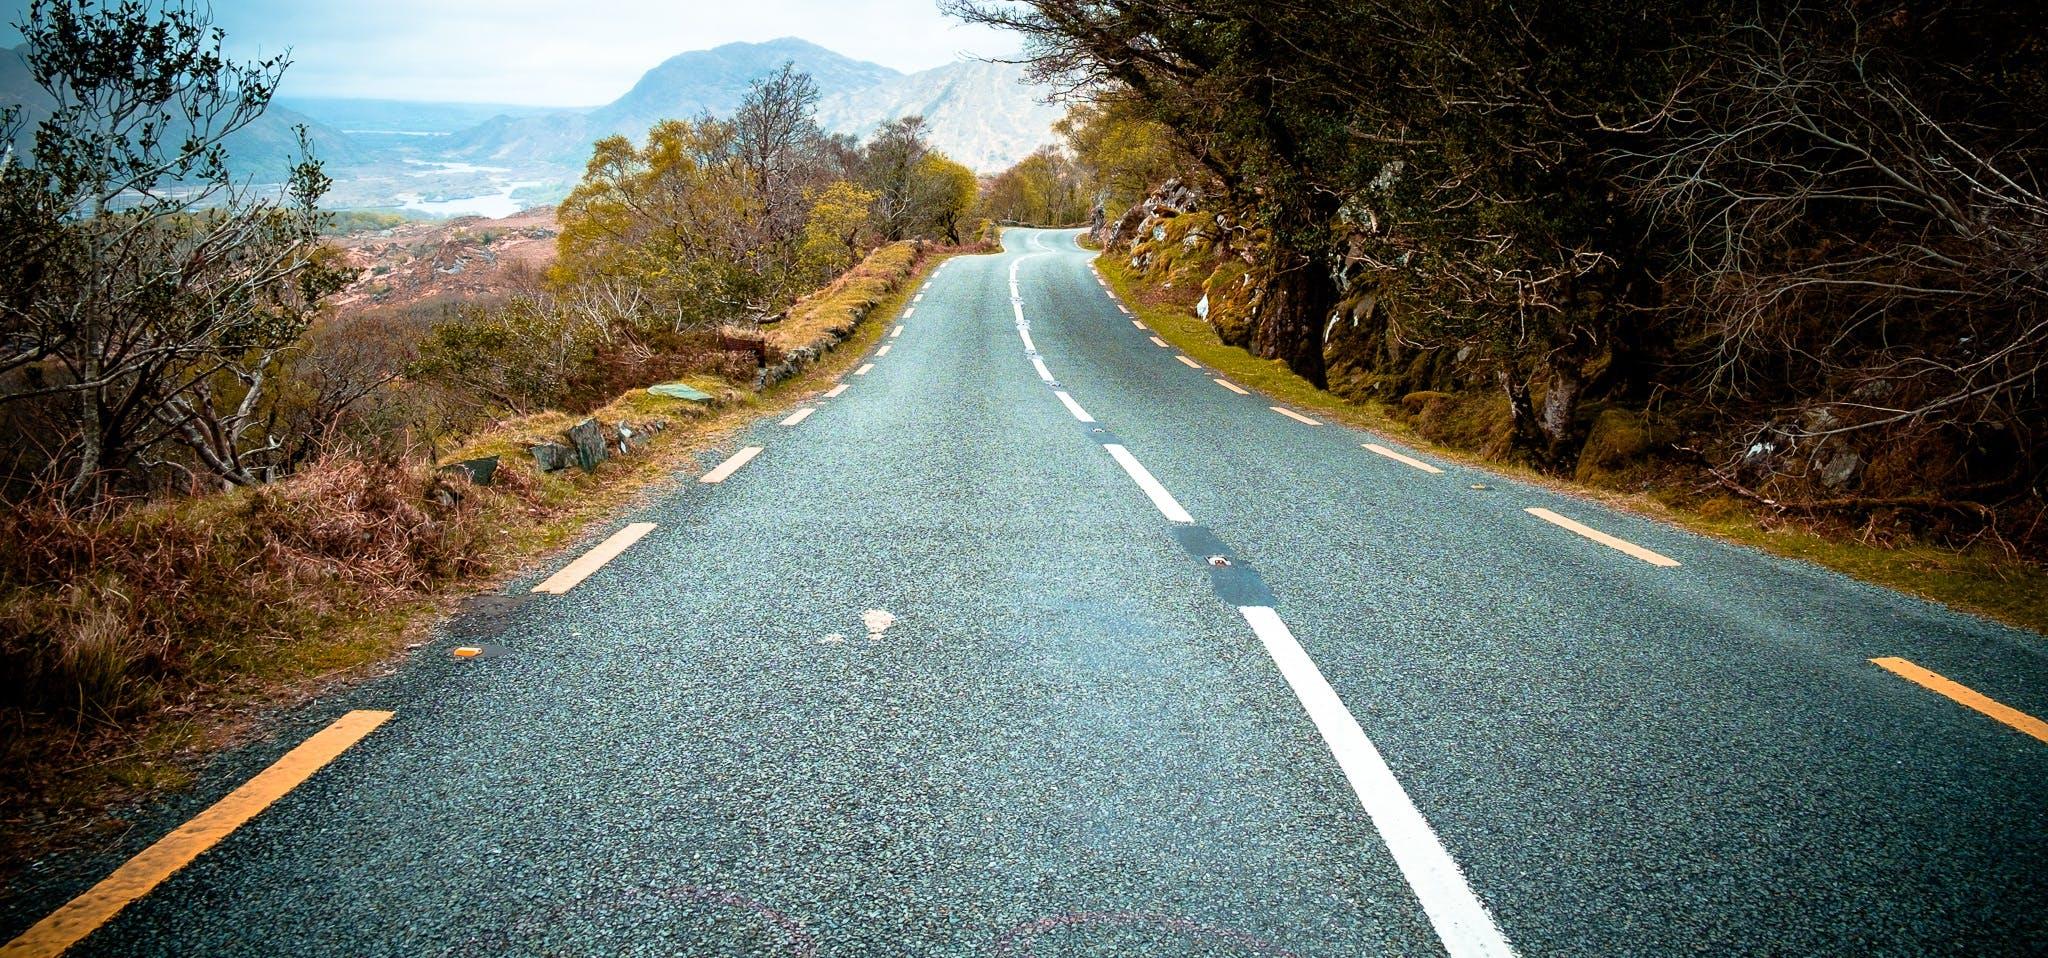 asphalt, curve, drive